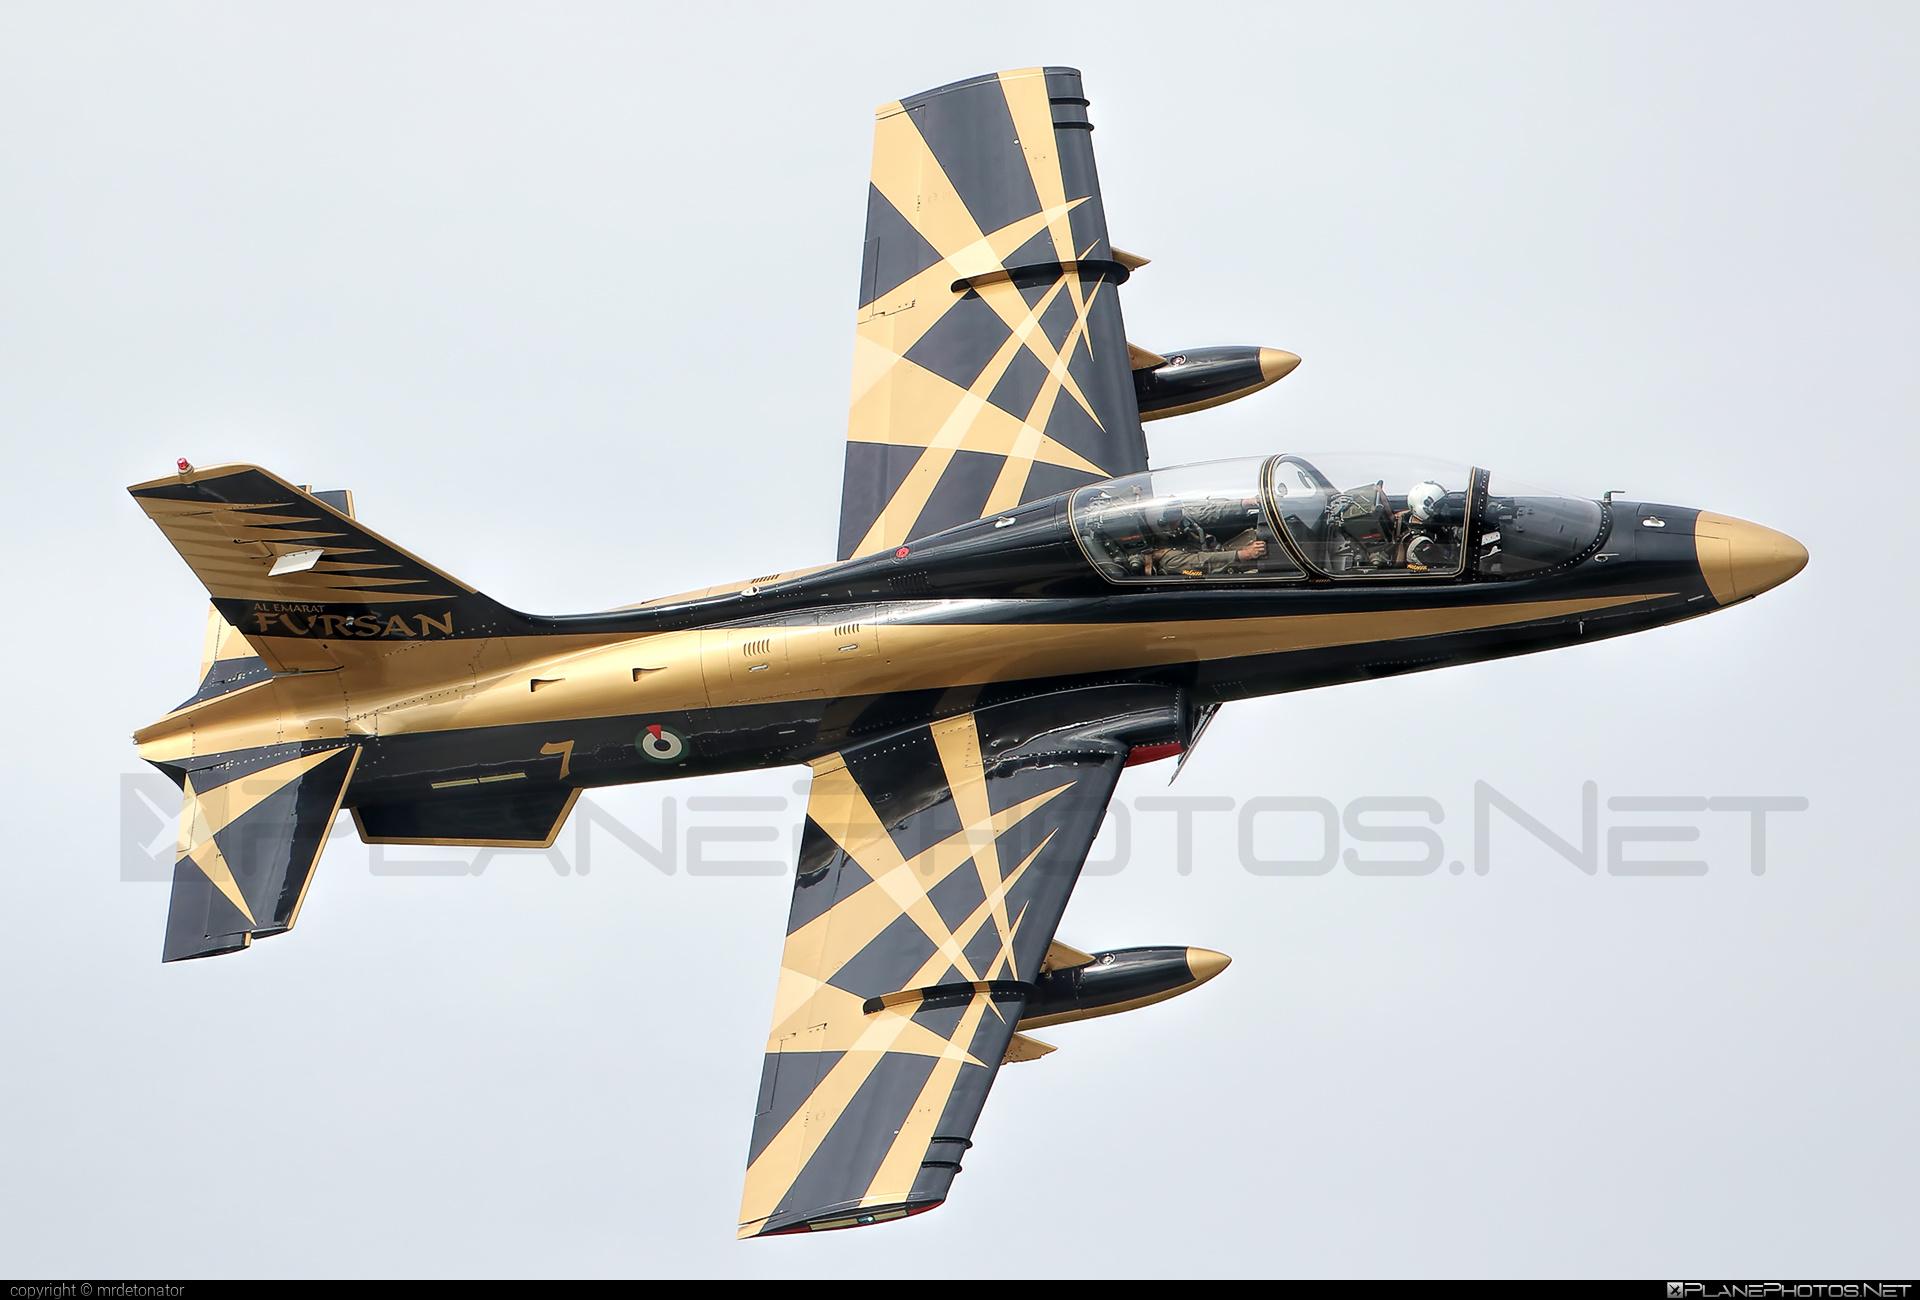 Aermacchi MB-339NAT - 438 operated by United Arab Emirates Air Force #aermacchi #mb339 #mb339nat #uaeaf #unitedarabemiratesairforce